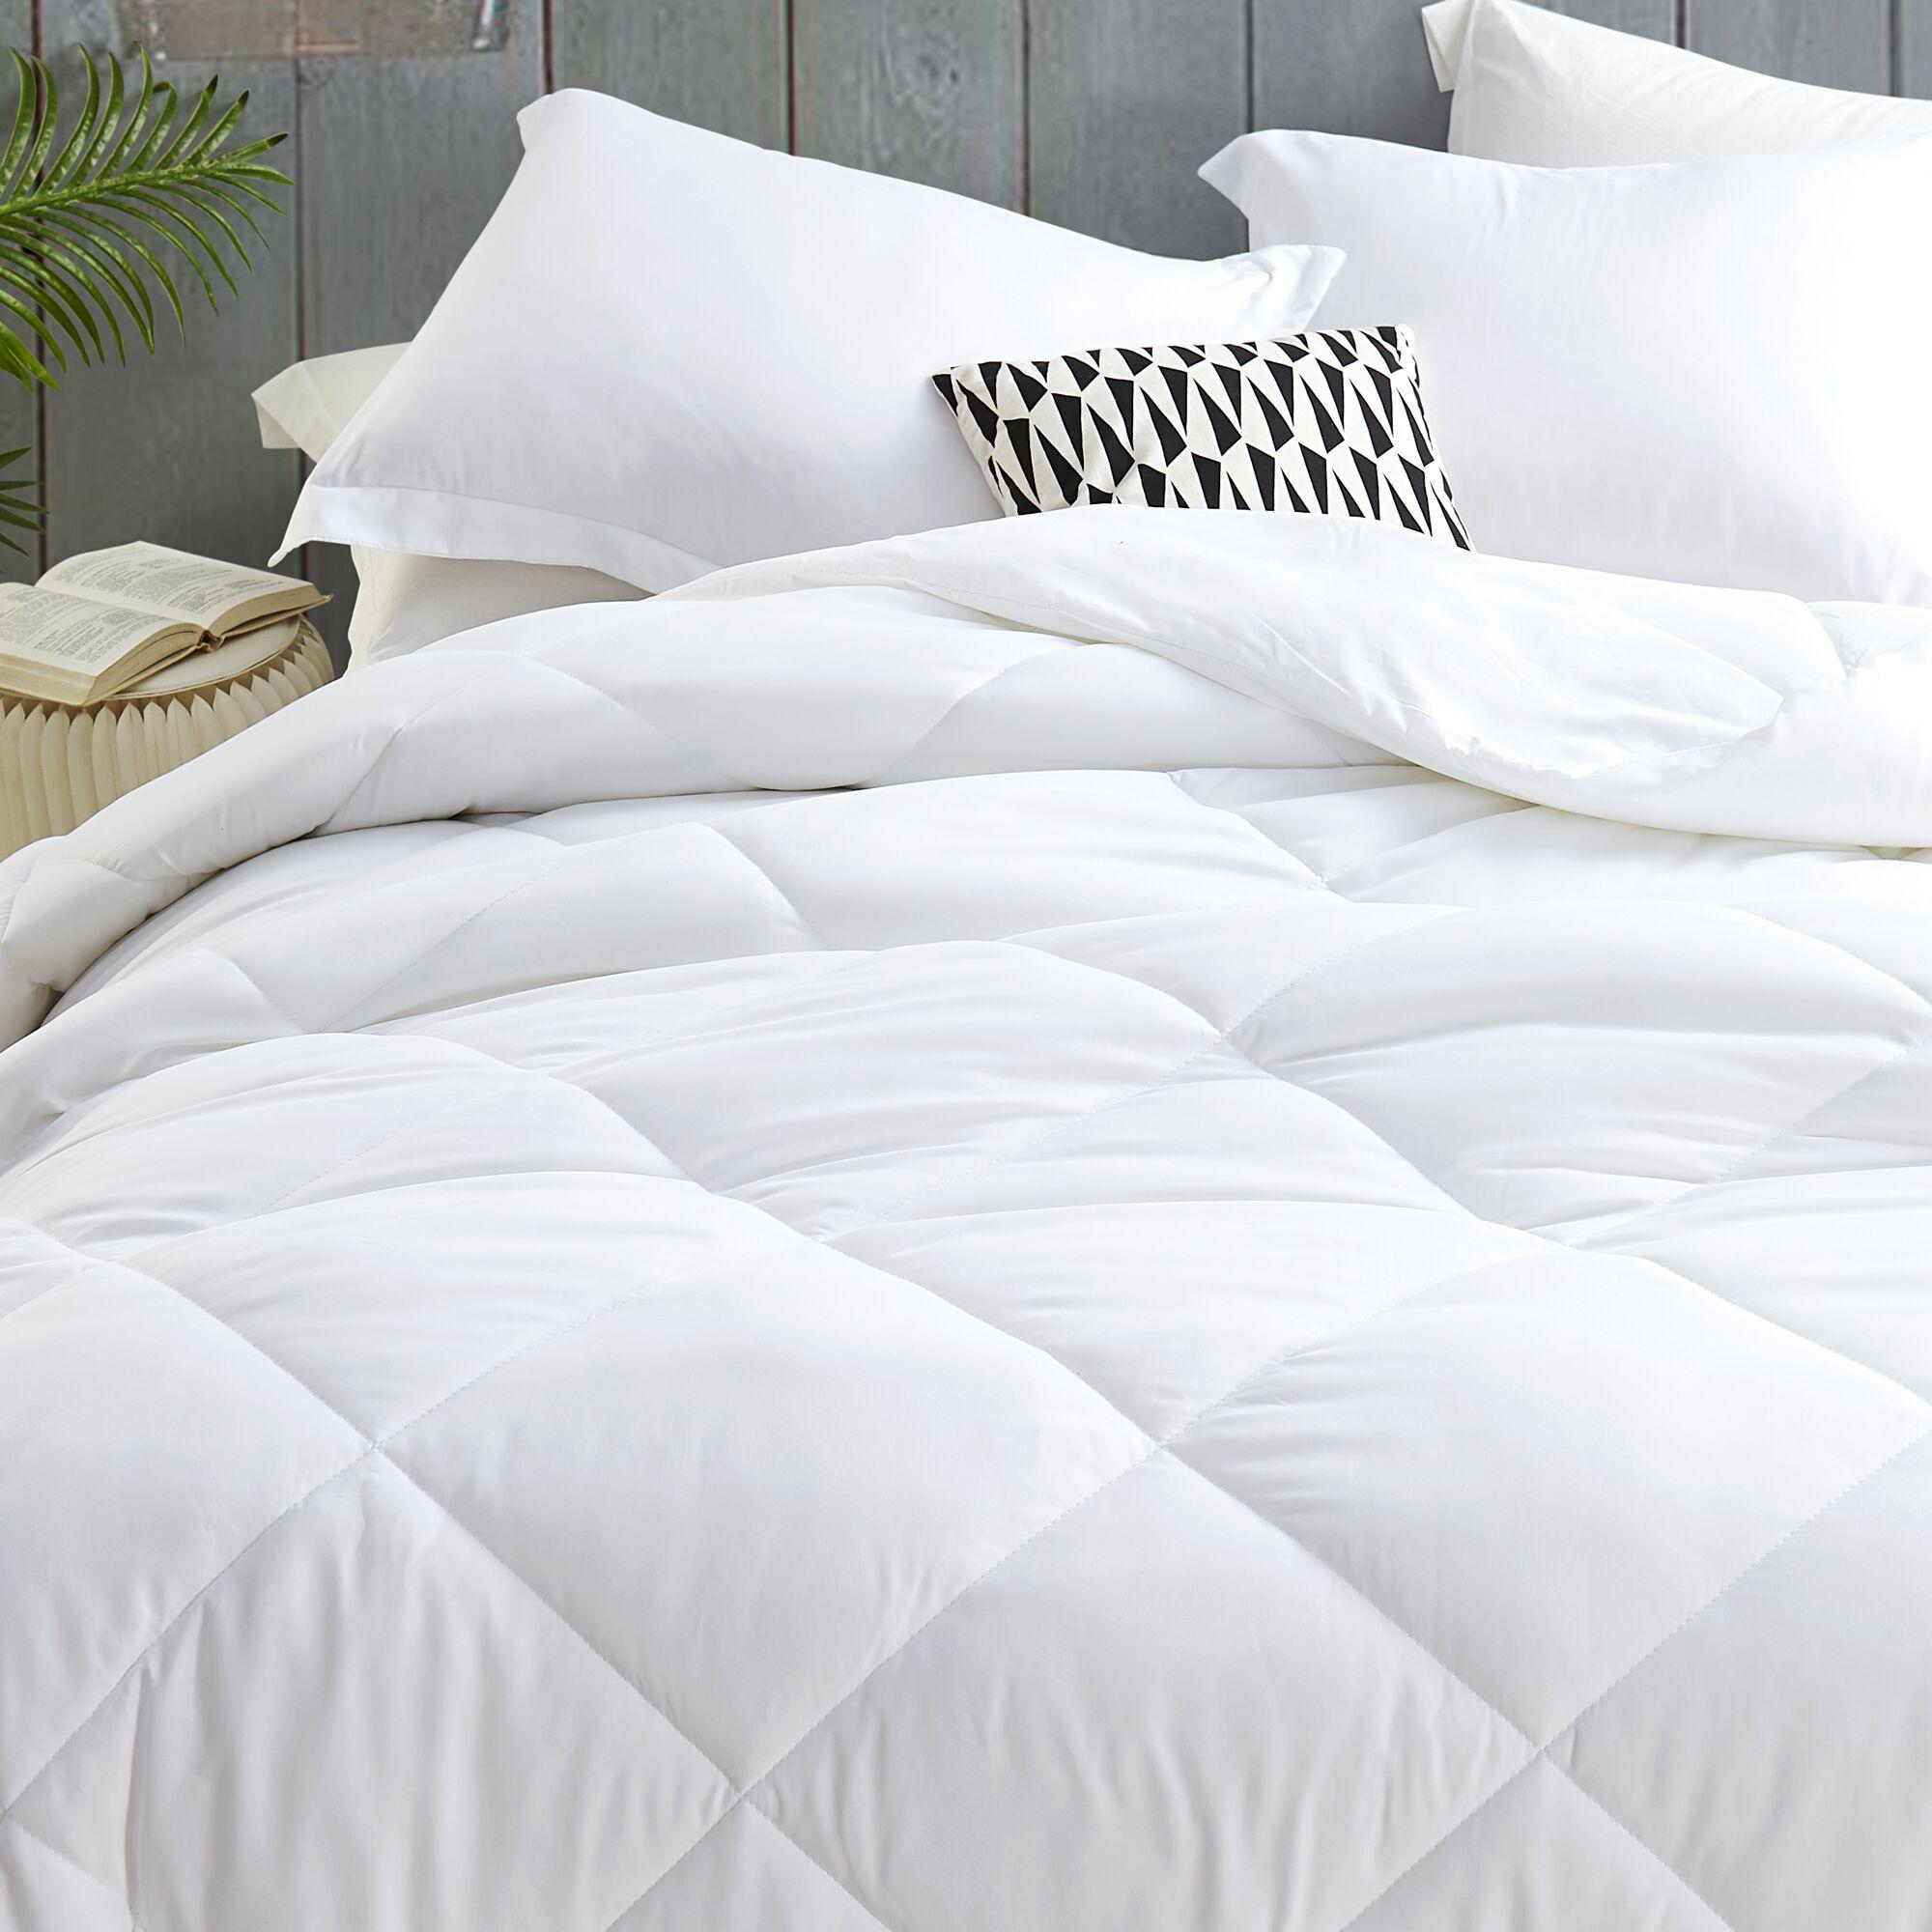 Ultra Cozy Down Alternative Duvet Insert Bed Size: King XL (109